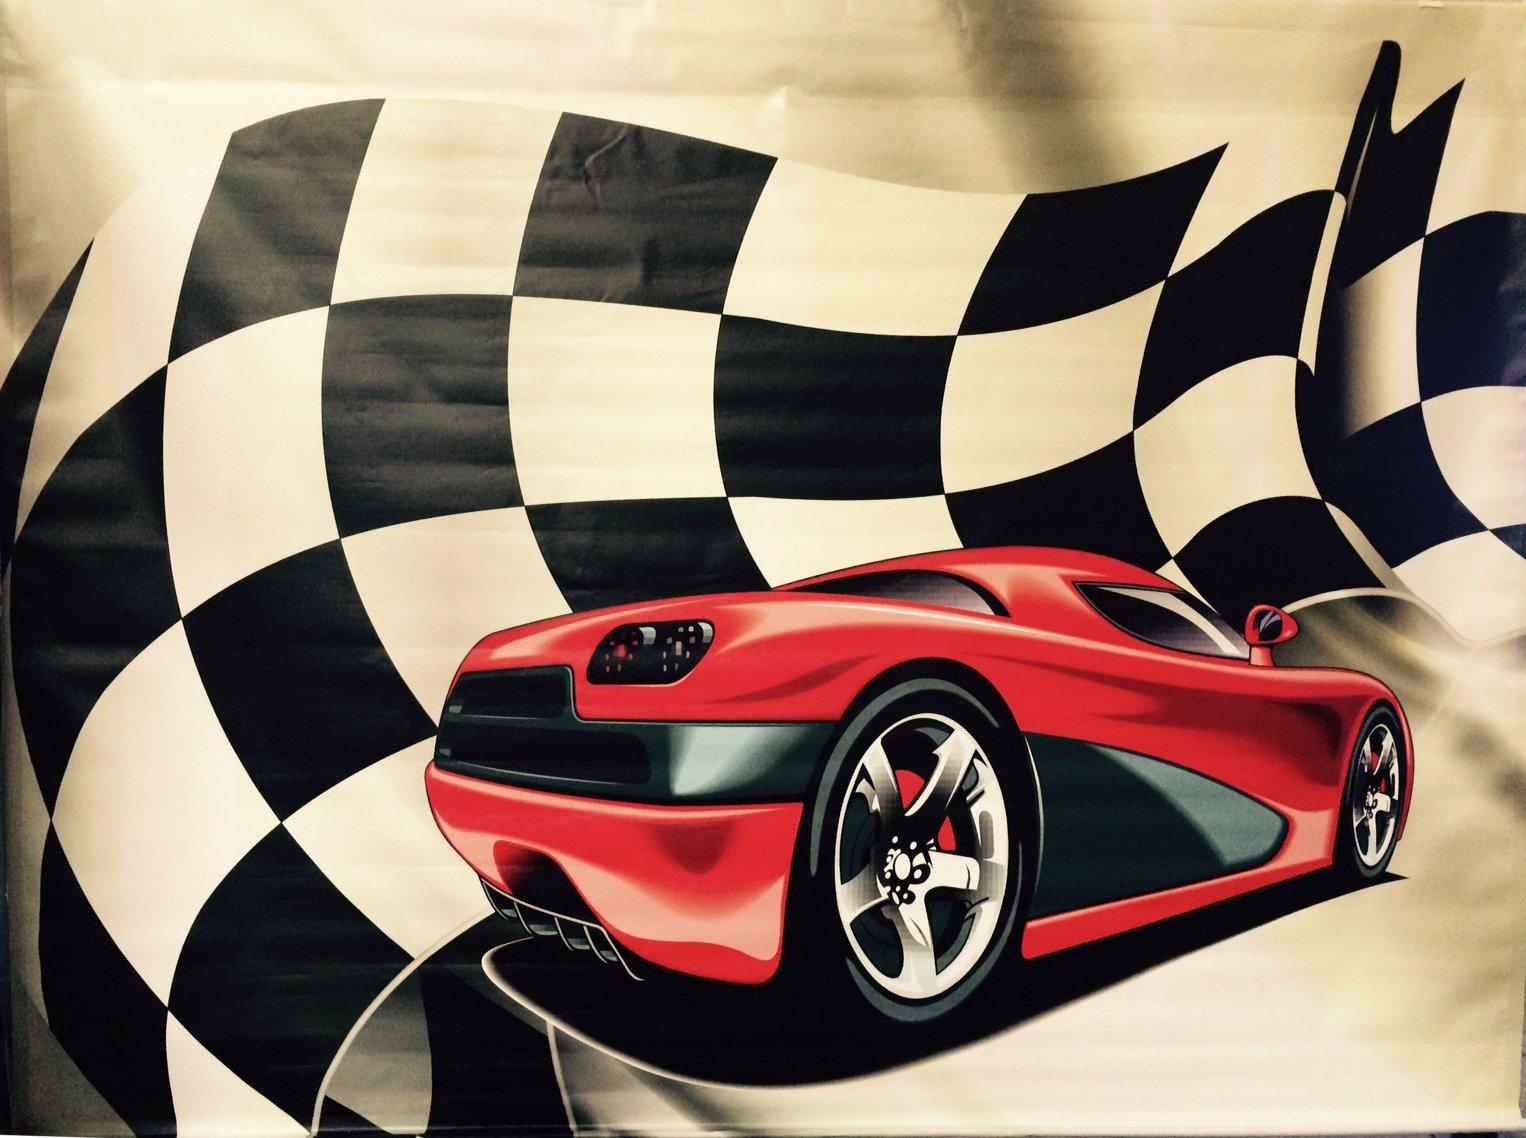 Backdrop Race Car Red 3m x 2.3m $60 incl frame & gst